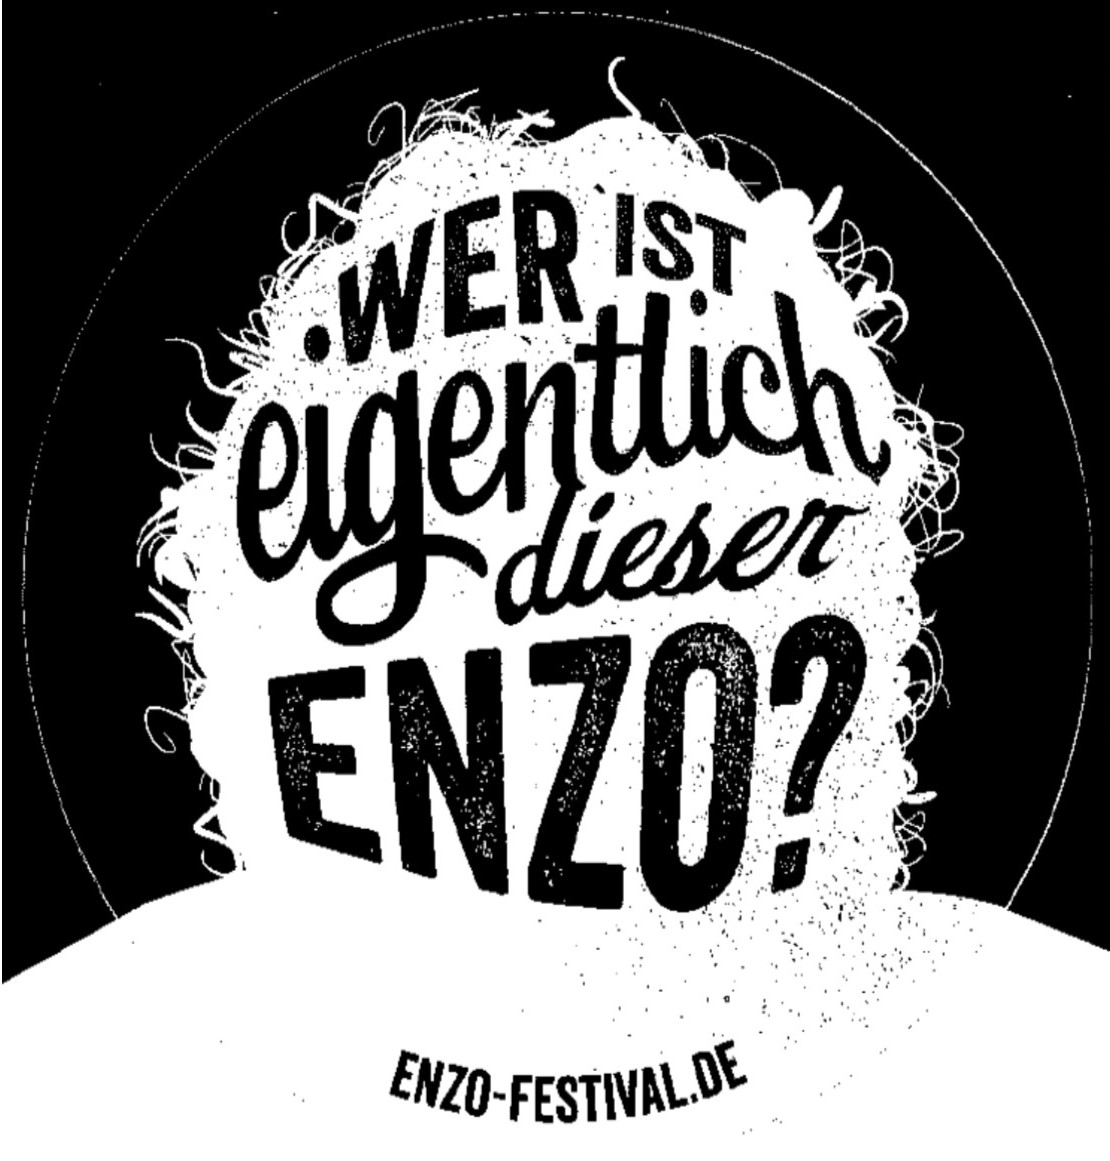 Enzo-Festival